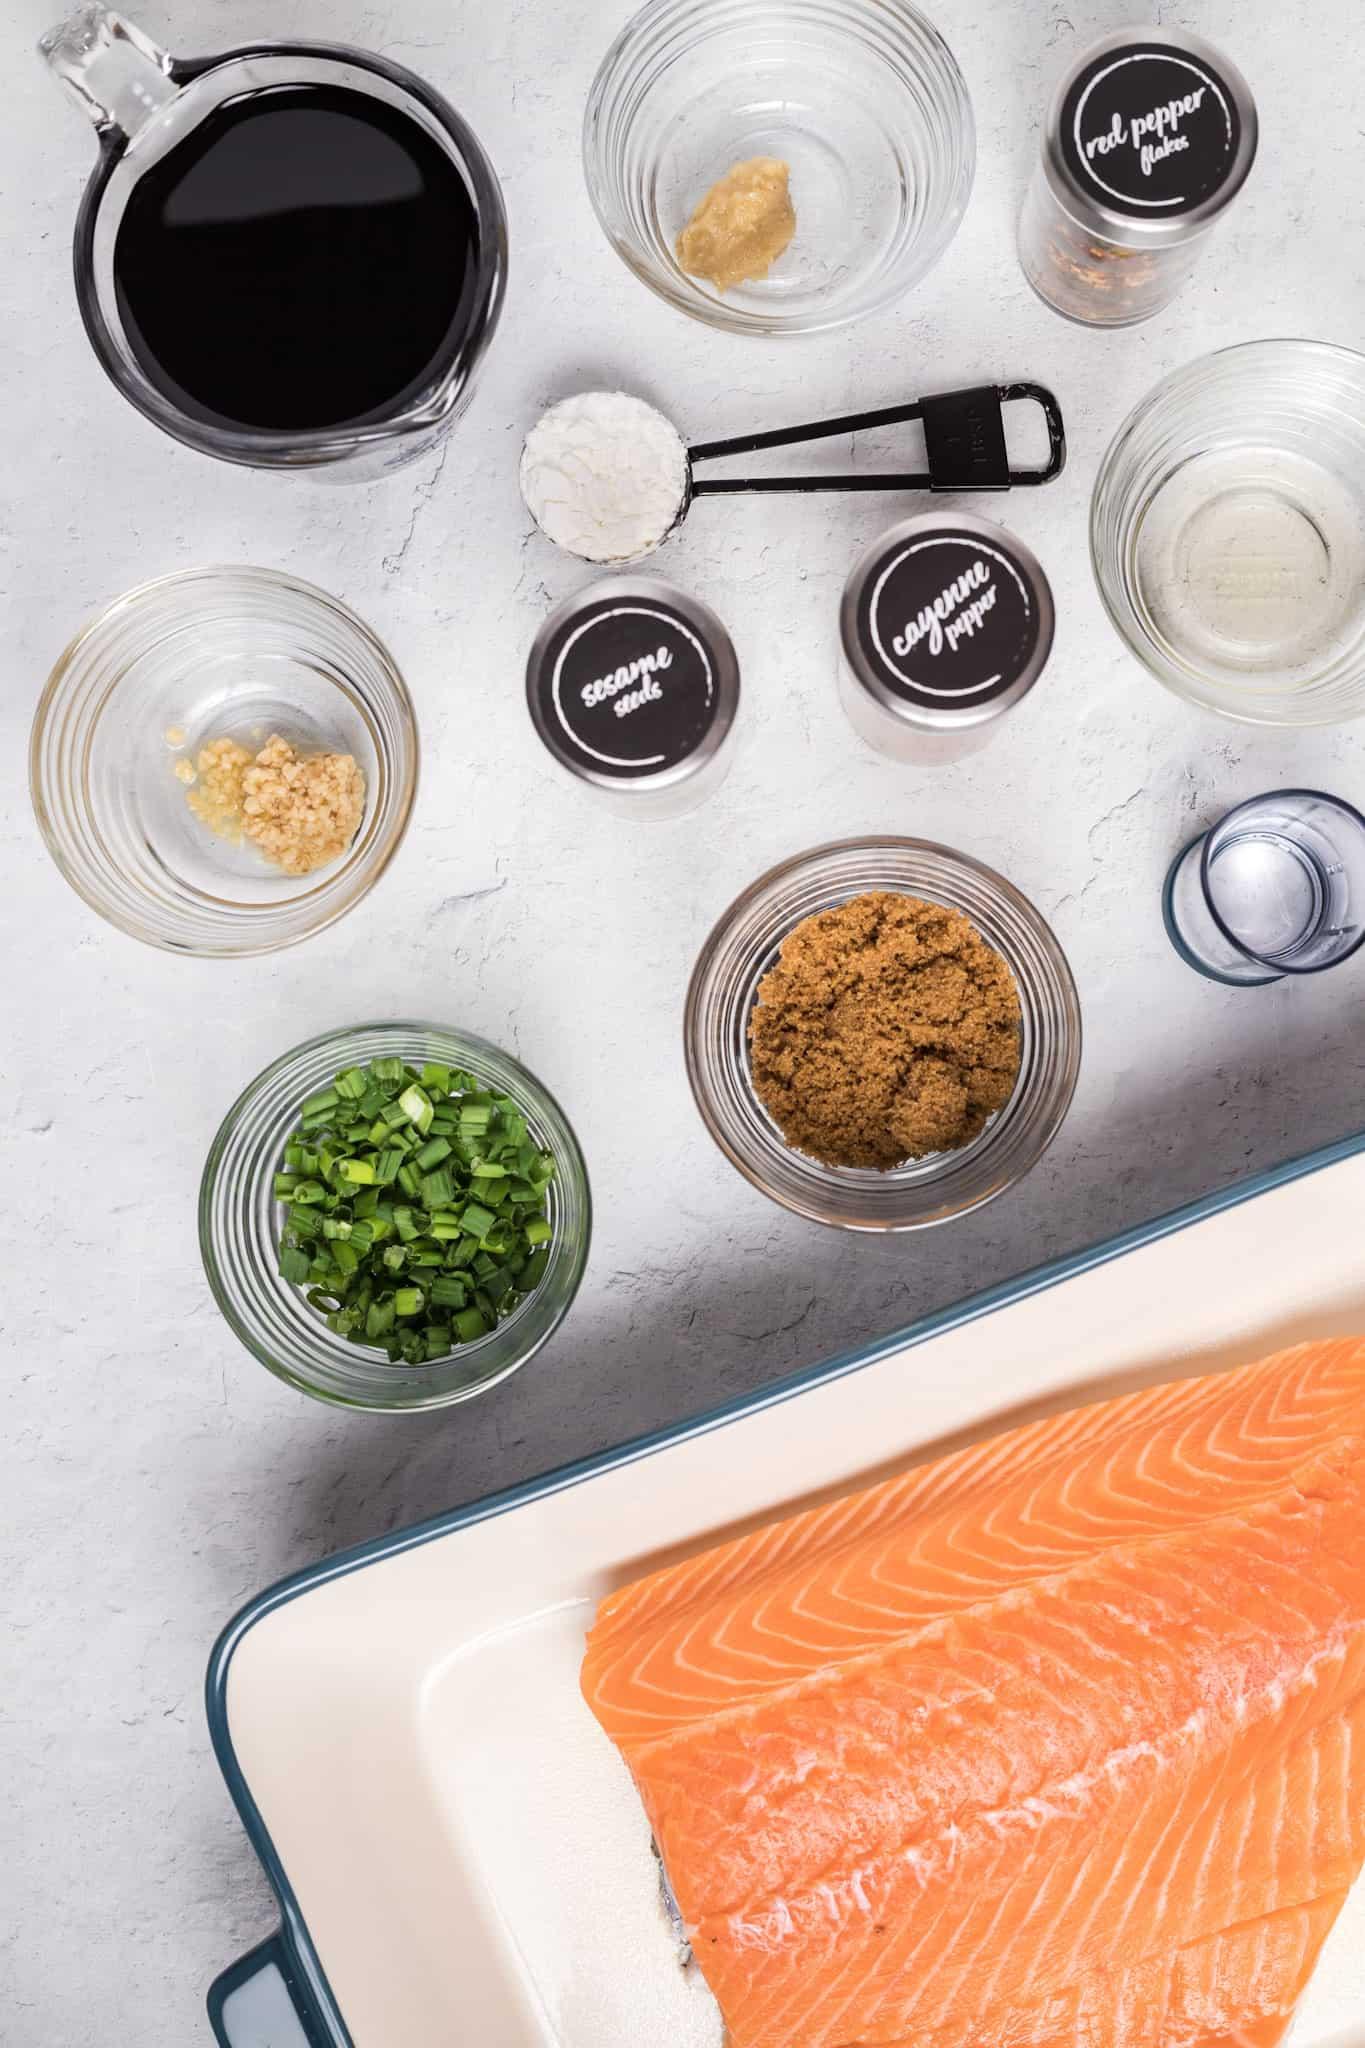 ingredients to make teriyaki salmon: center cut salmon, soy sauce, minced ginger, minced garlic, cornstarch, water, brown sugar, rice vinegar, sesame seeds, cayenne pepper, green onions.